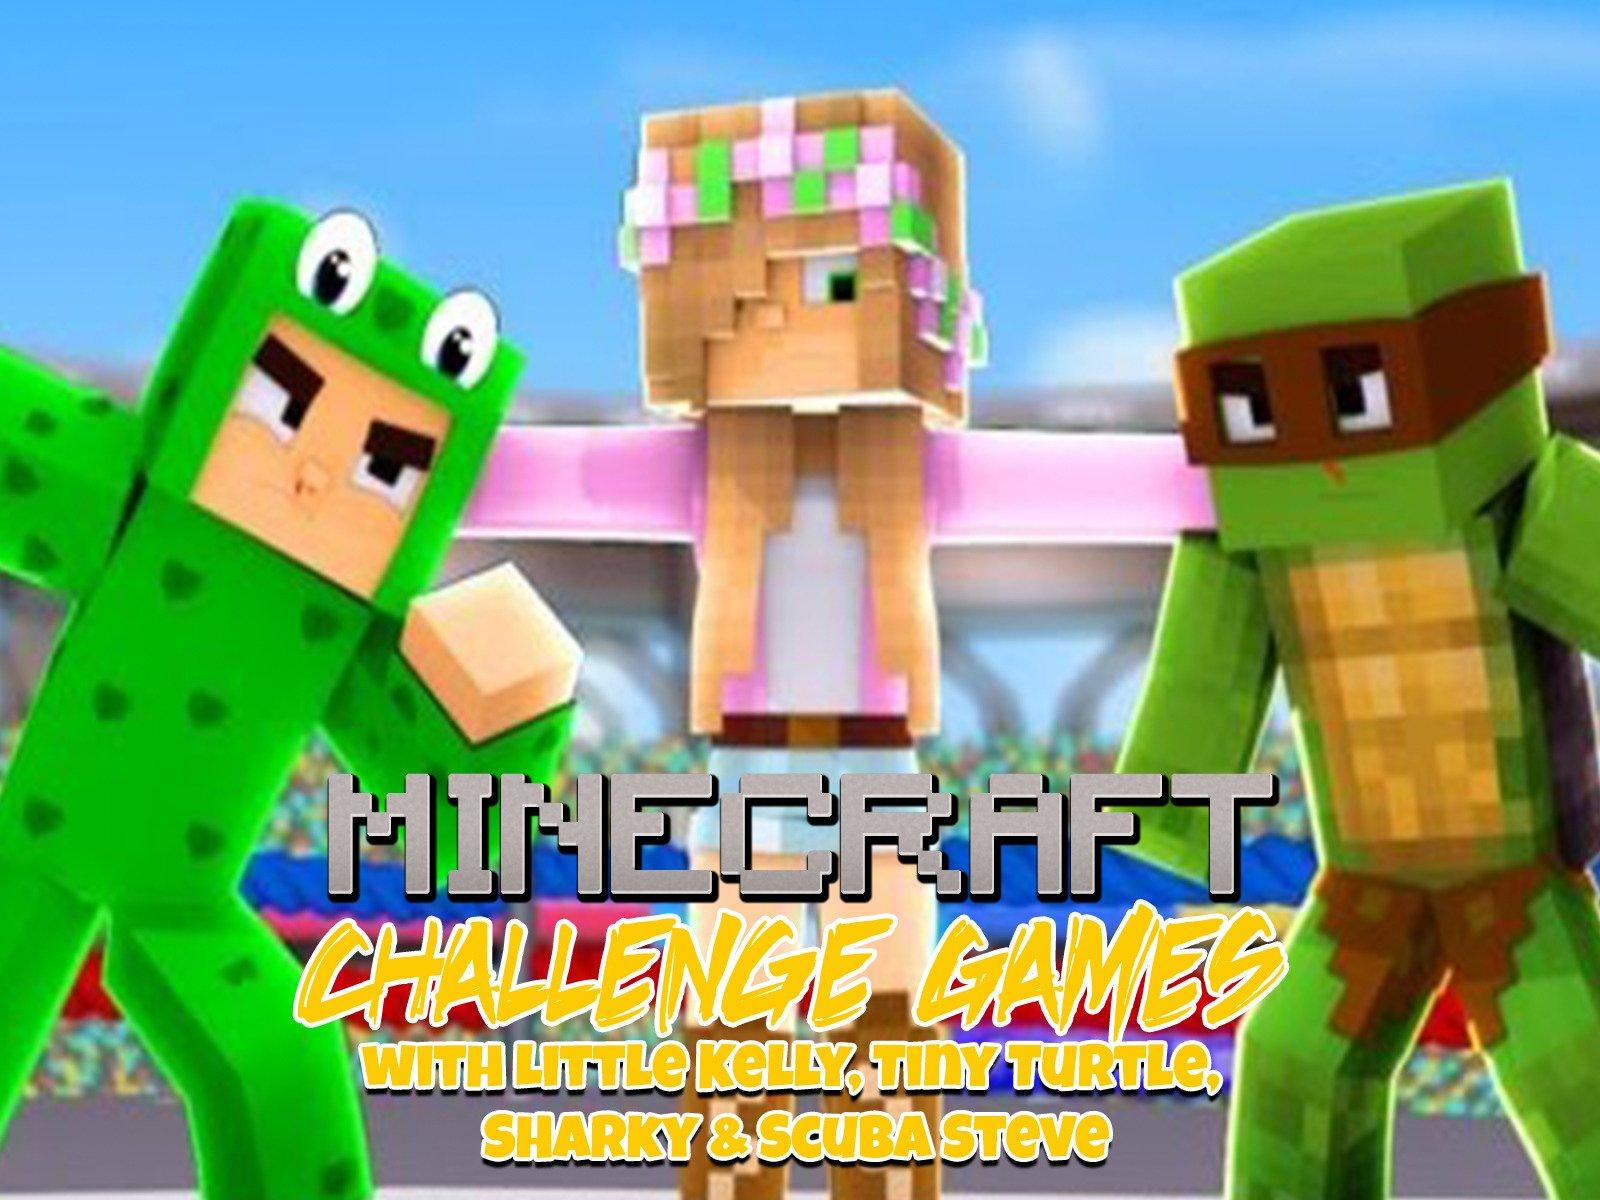 Clip: Challenge Games Minecraft with Little Kelly, Tiny Turtle, Sharky & Scuba Steve - Season 3